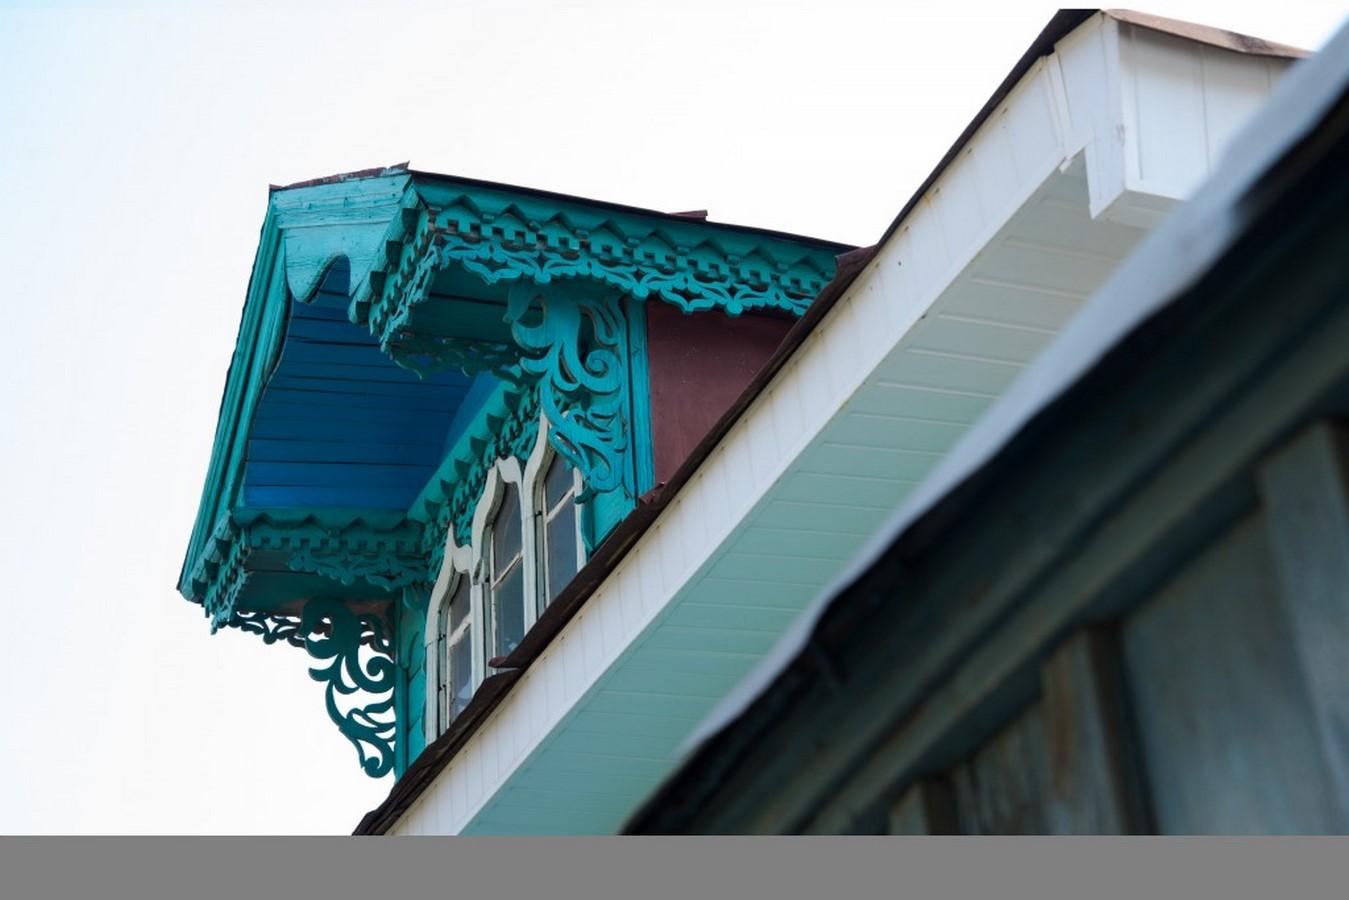 15 beautiful vintage apartments around the world - Sheet41